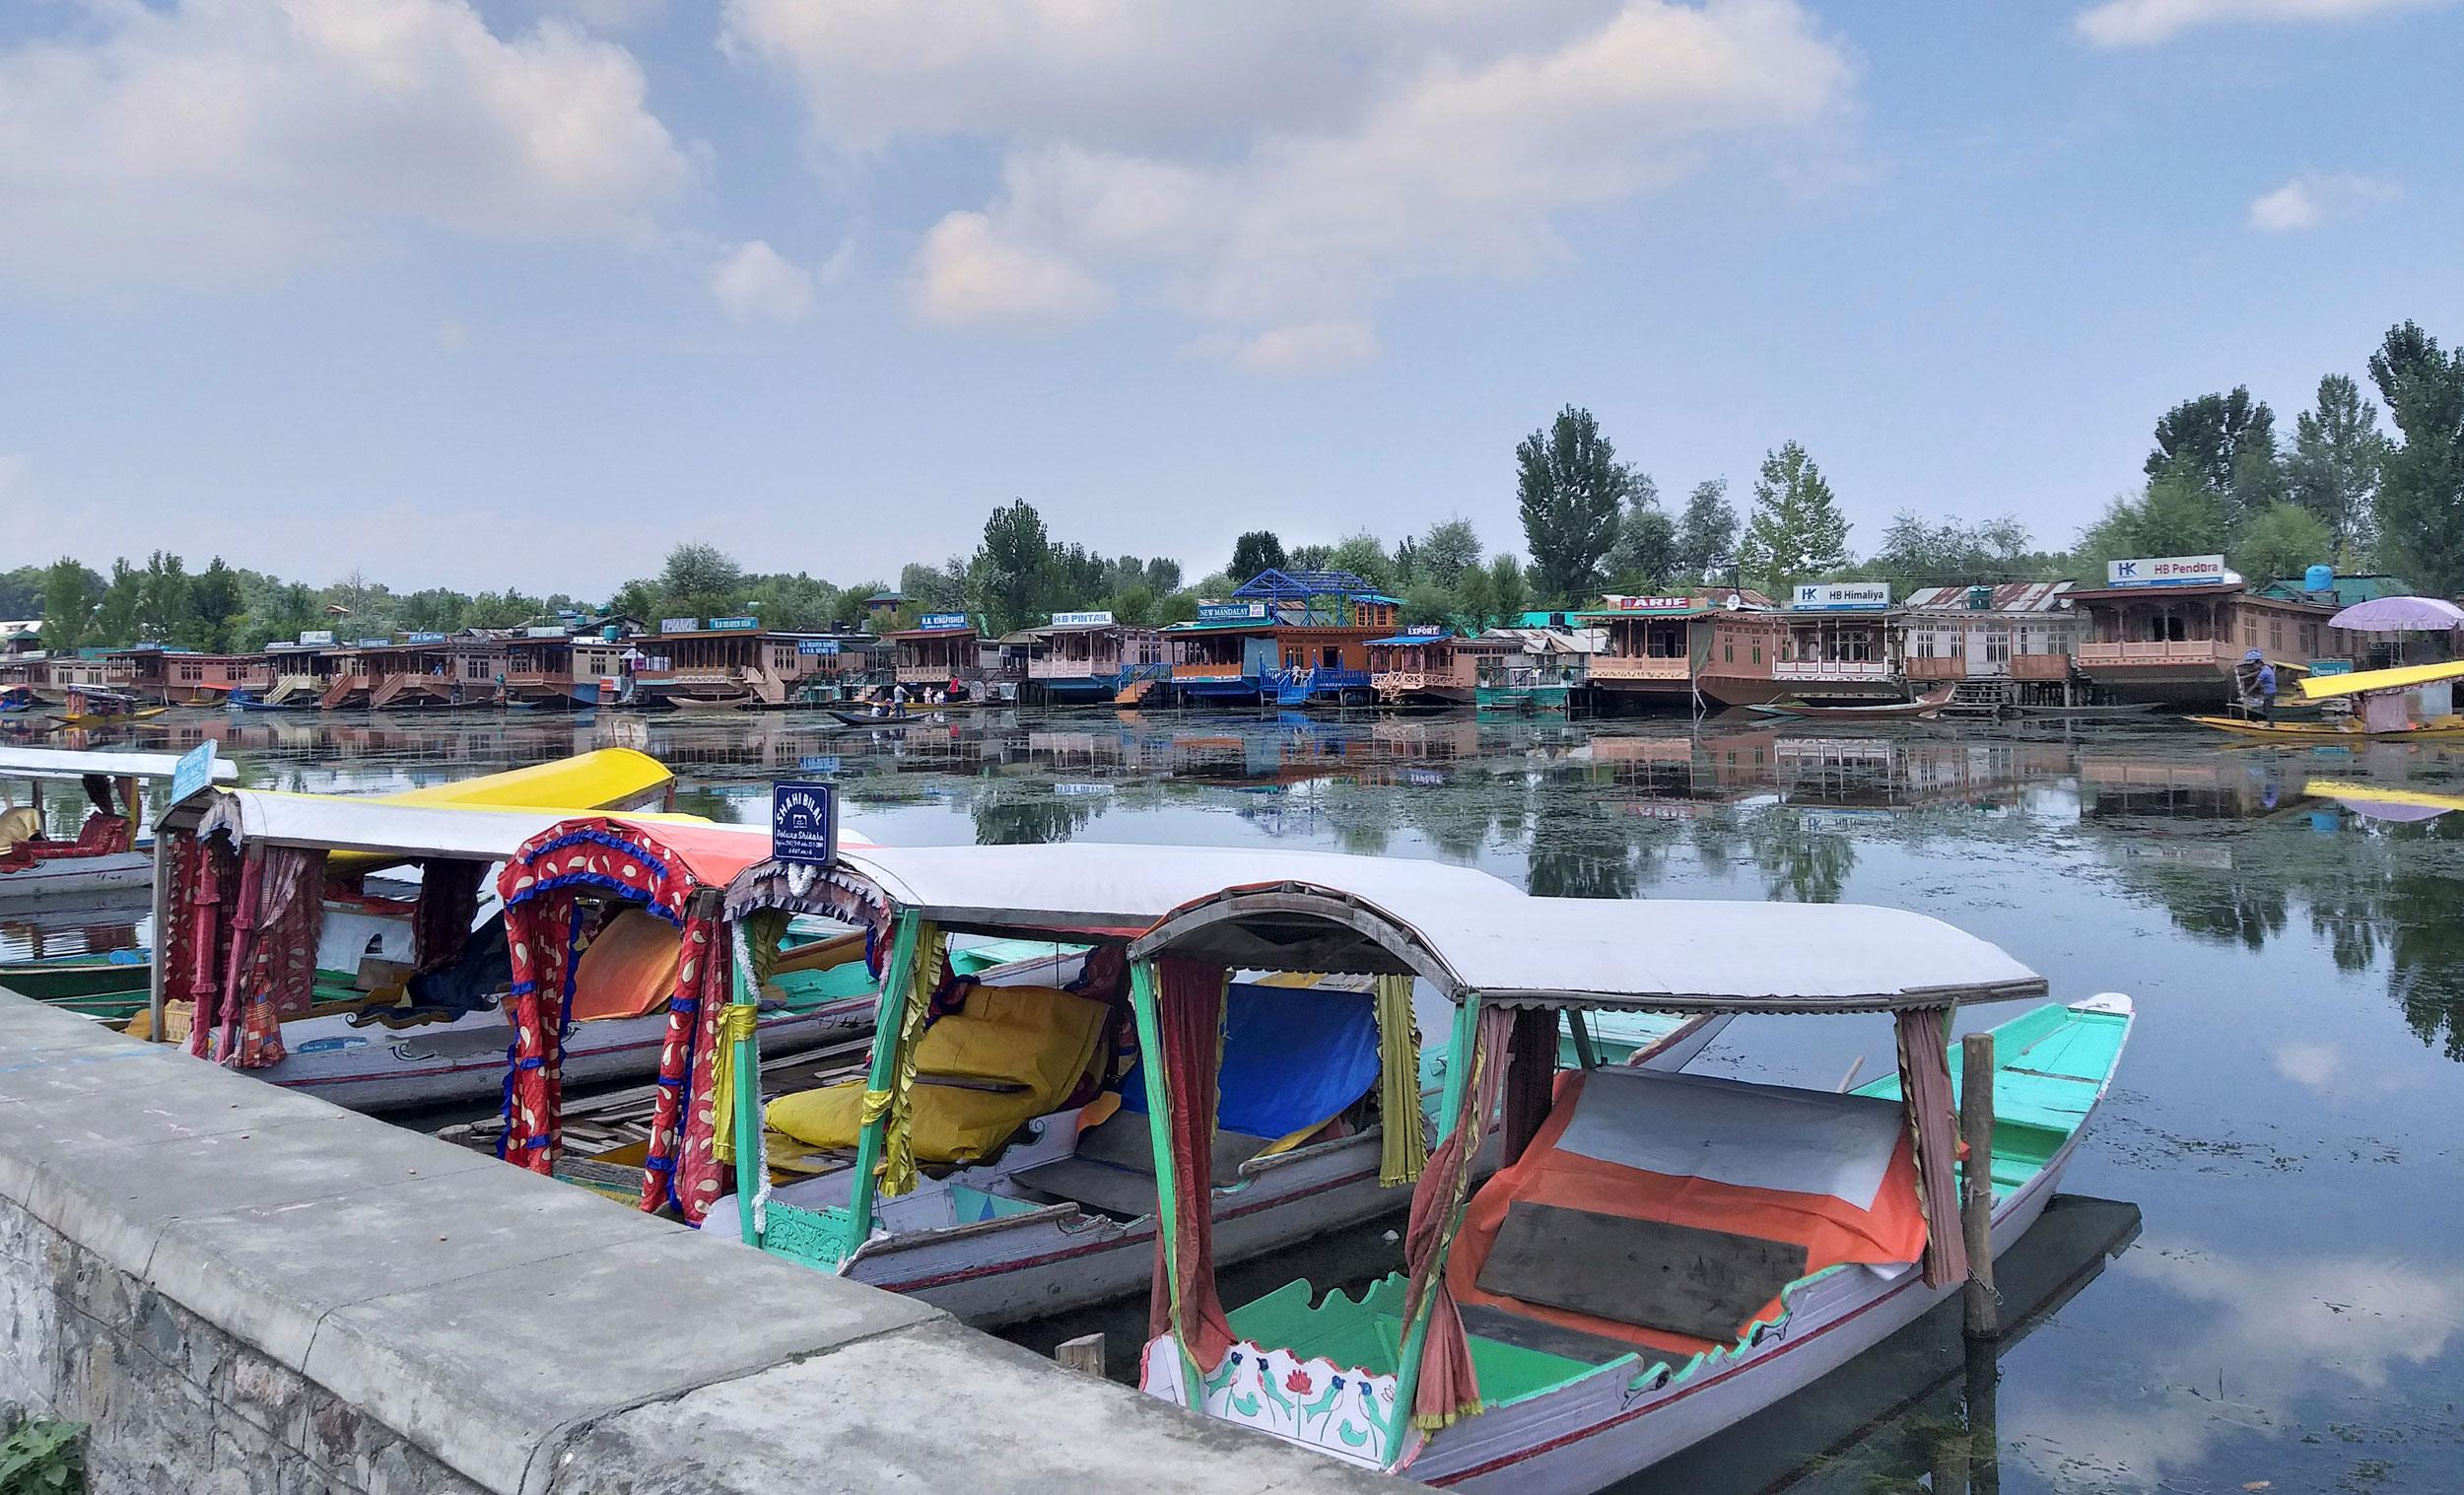 Shikaras (traditional gondolas) parked on the Dal Lake in Srinagar on August 8, 2019.